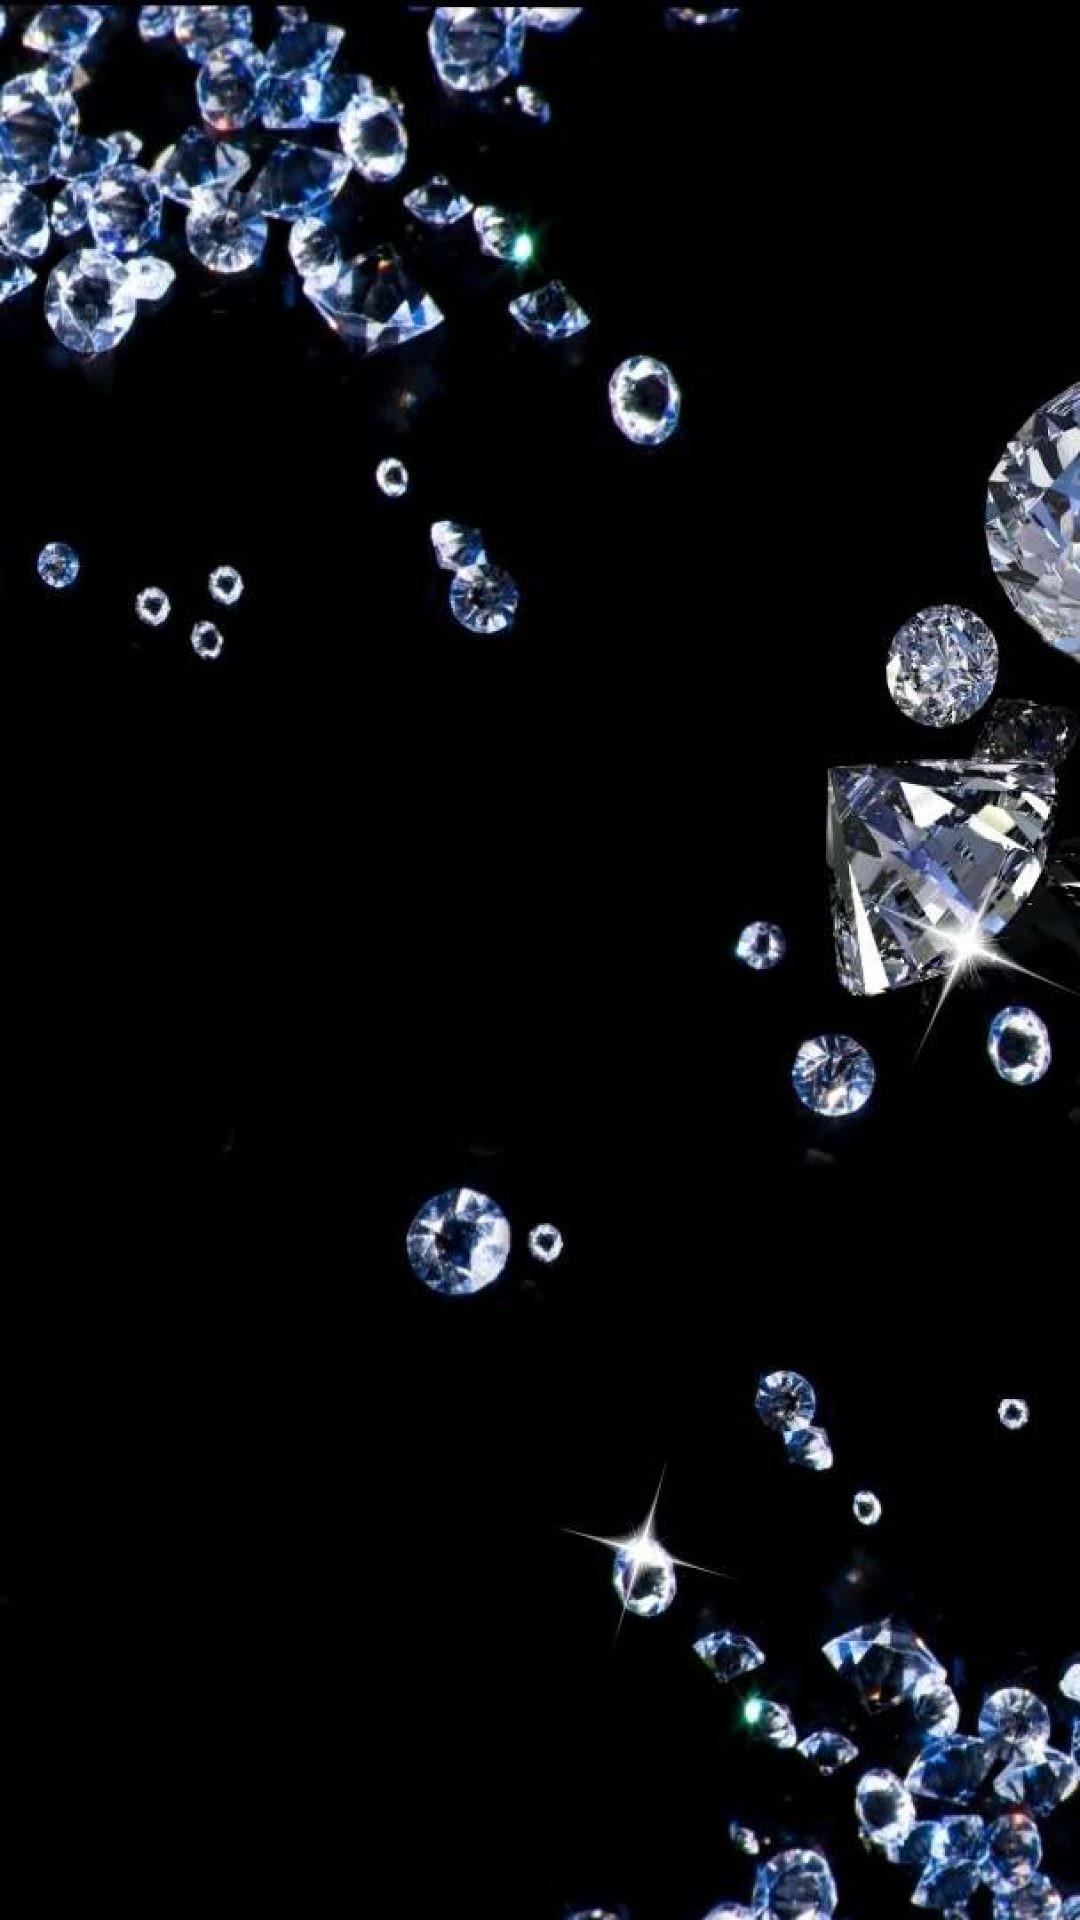 Res: 1080x1920, Black Diamond Desktop Wallpaper Hd Diamonds 1080p Of Mobile High Quality